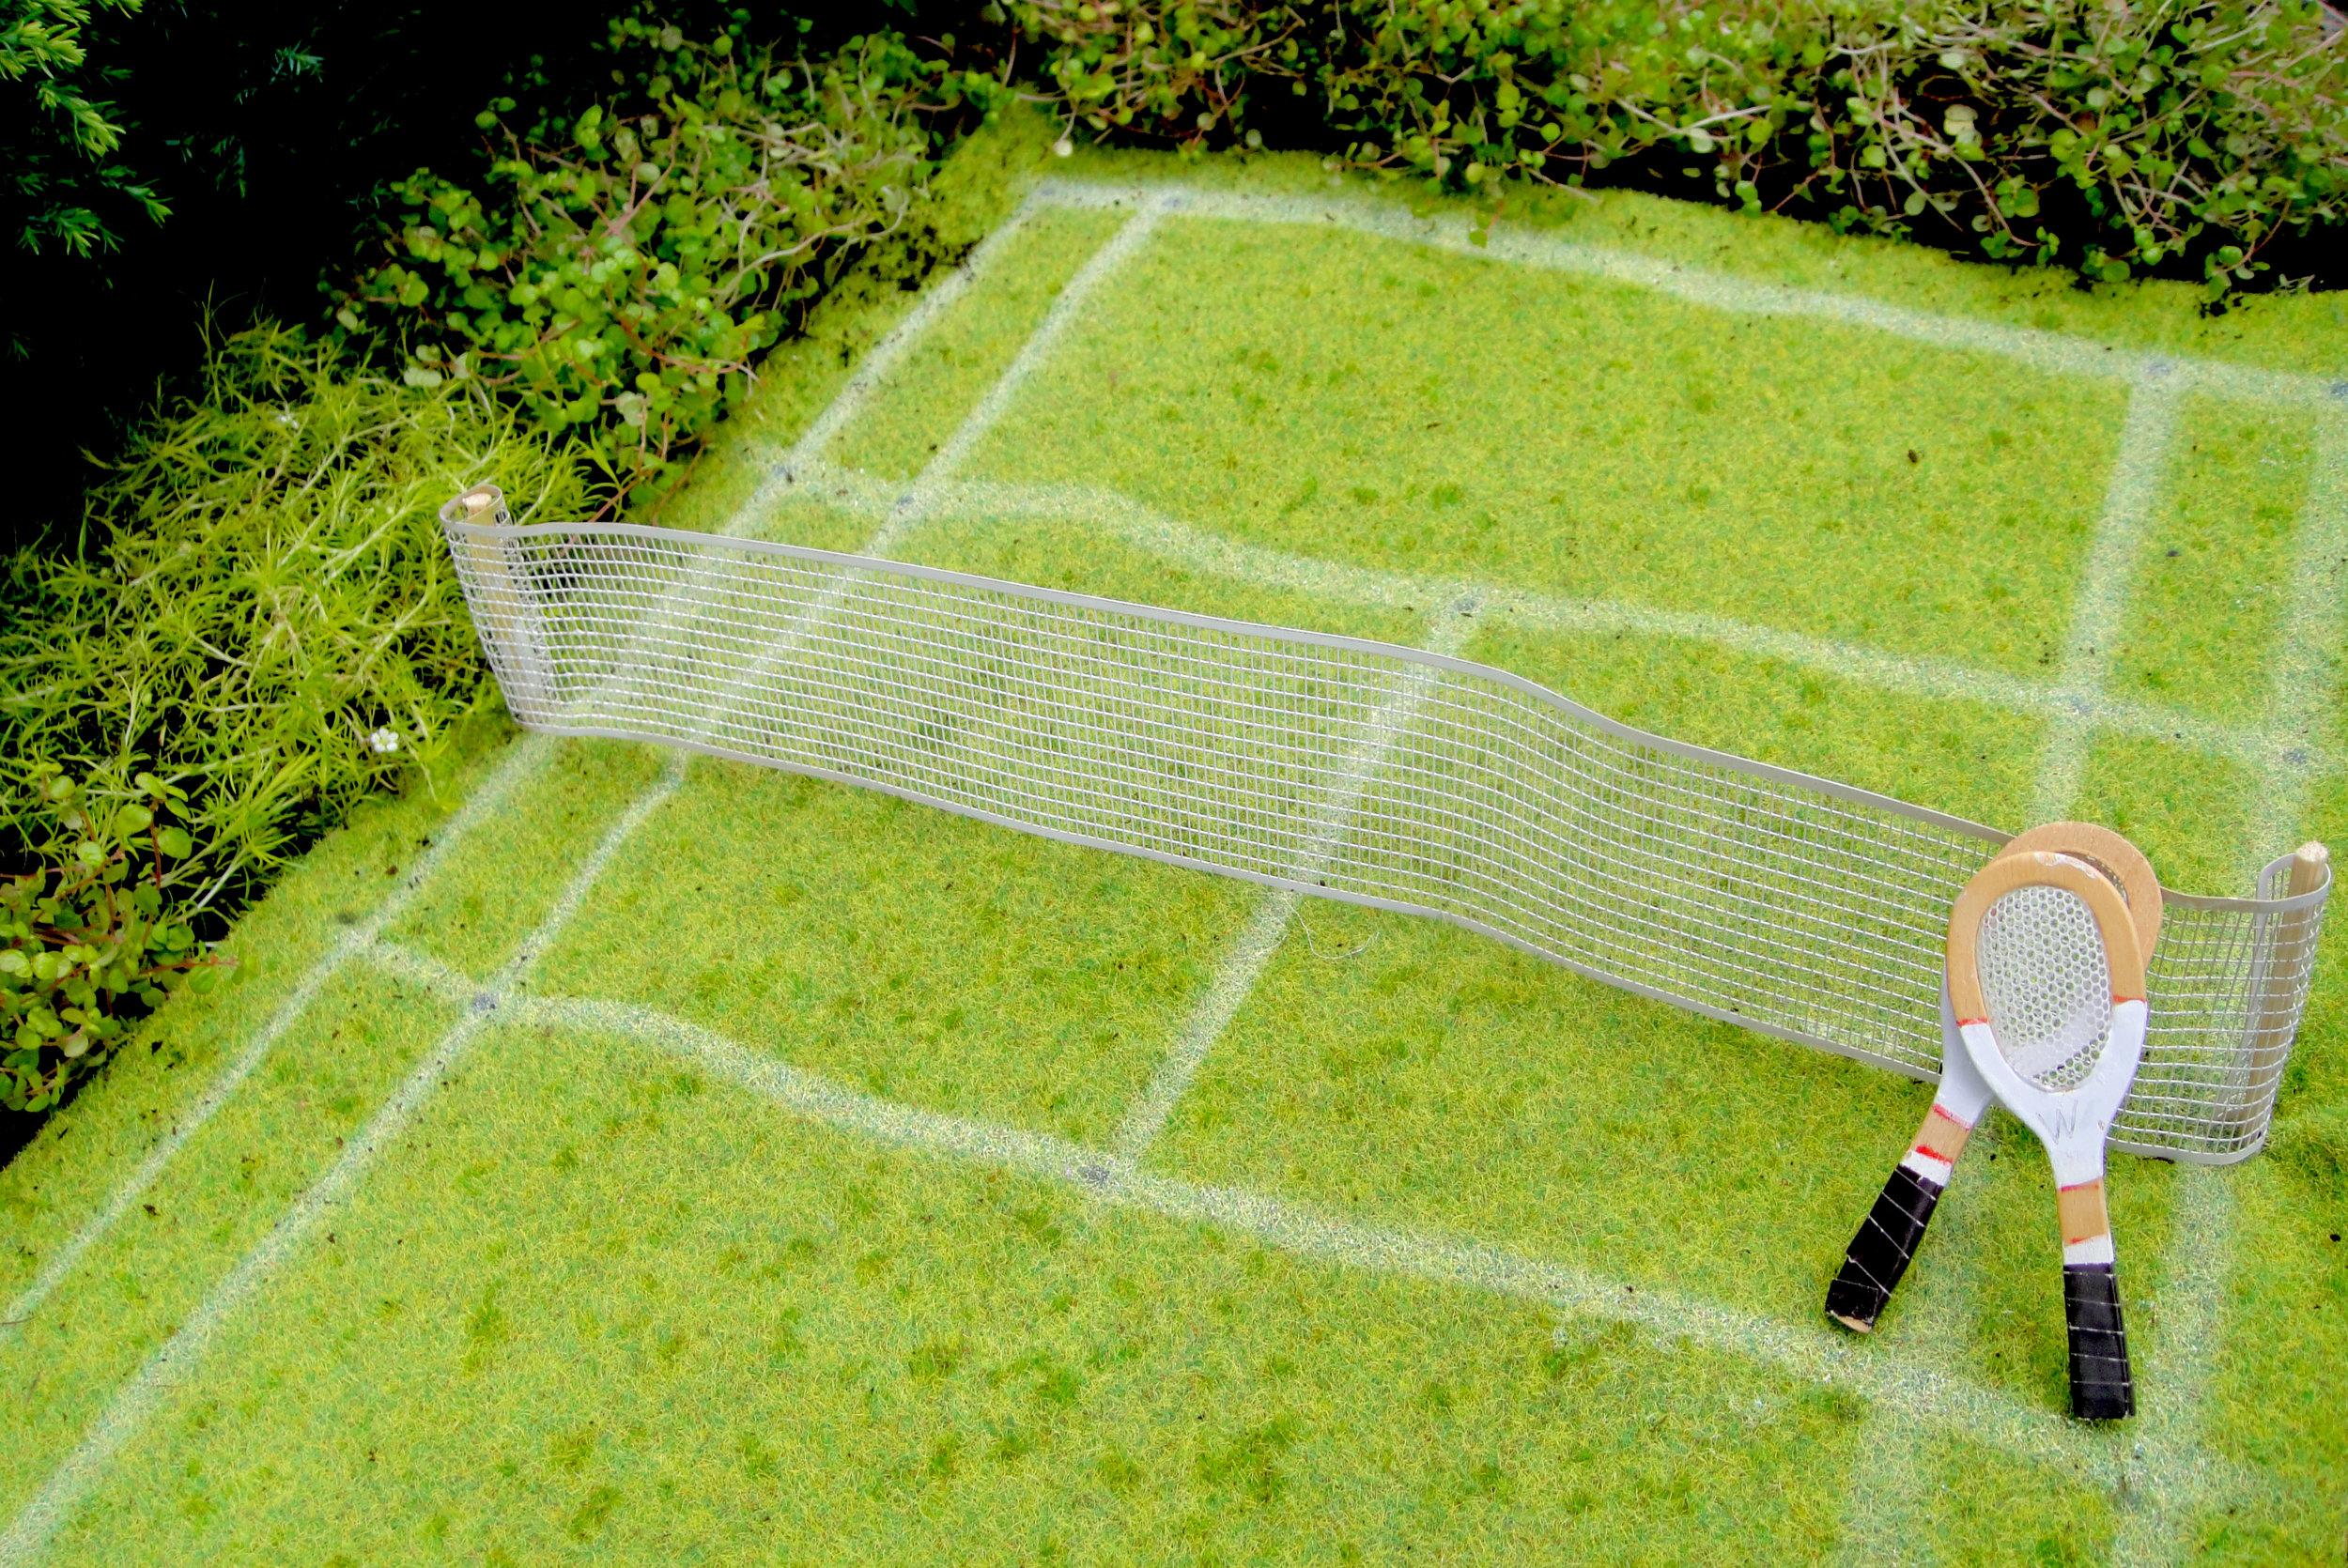 wimbledon tennis London pothole garden raquet